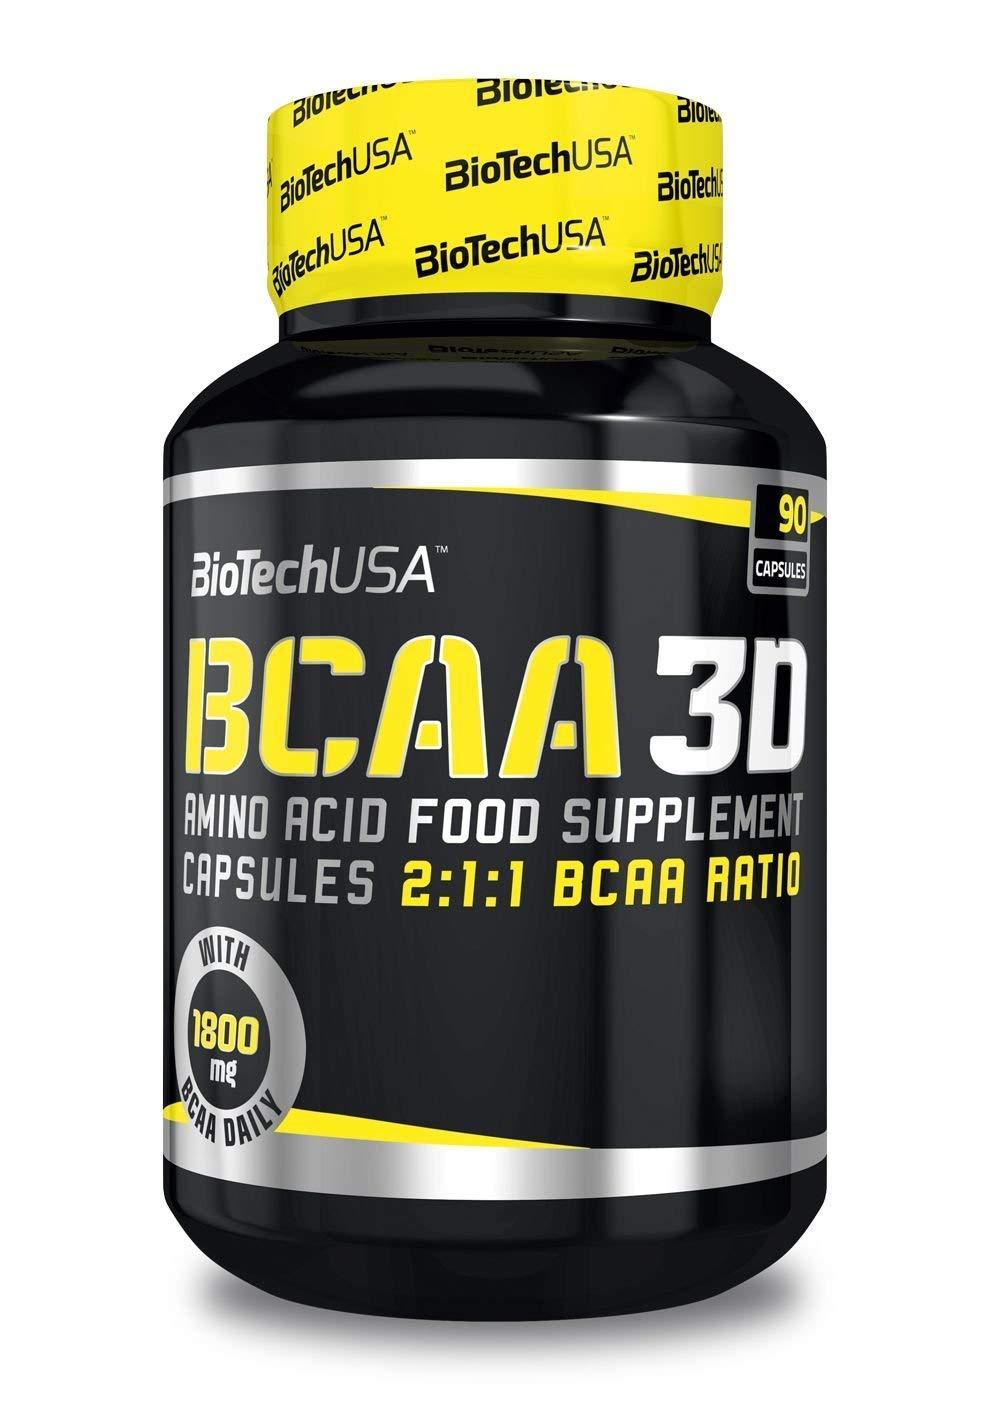 BIOTECH USA BCAA 3D / 180 Caps L-Leucine, L-Isoleucine and L-Valine in a 2:1:1 Ratio Branched Chain Essential Amino Acids Capsules